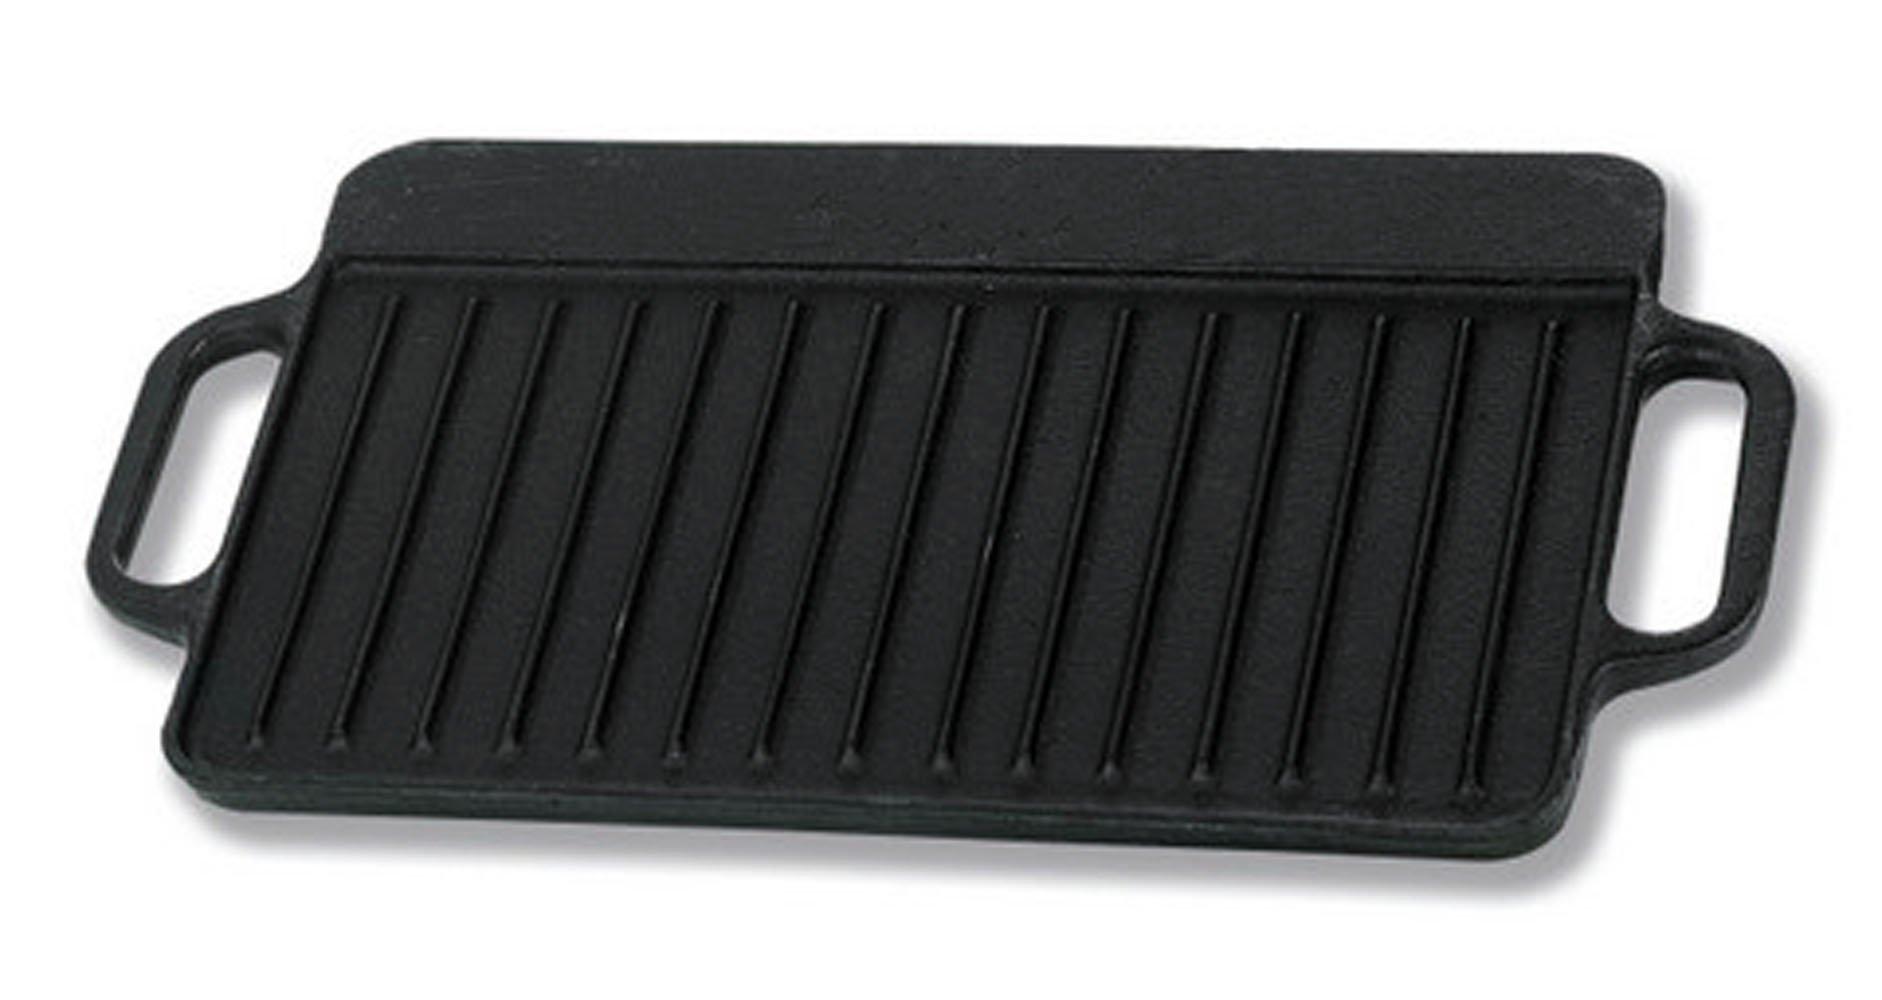 IMUSA USA CORONA-189Y Preseason Reversible Griddle, 12.5-Inch, Black